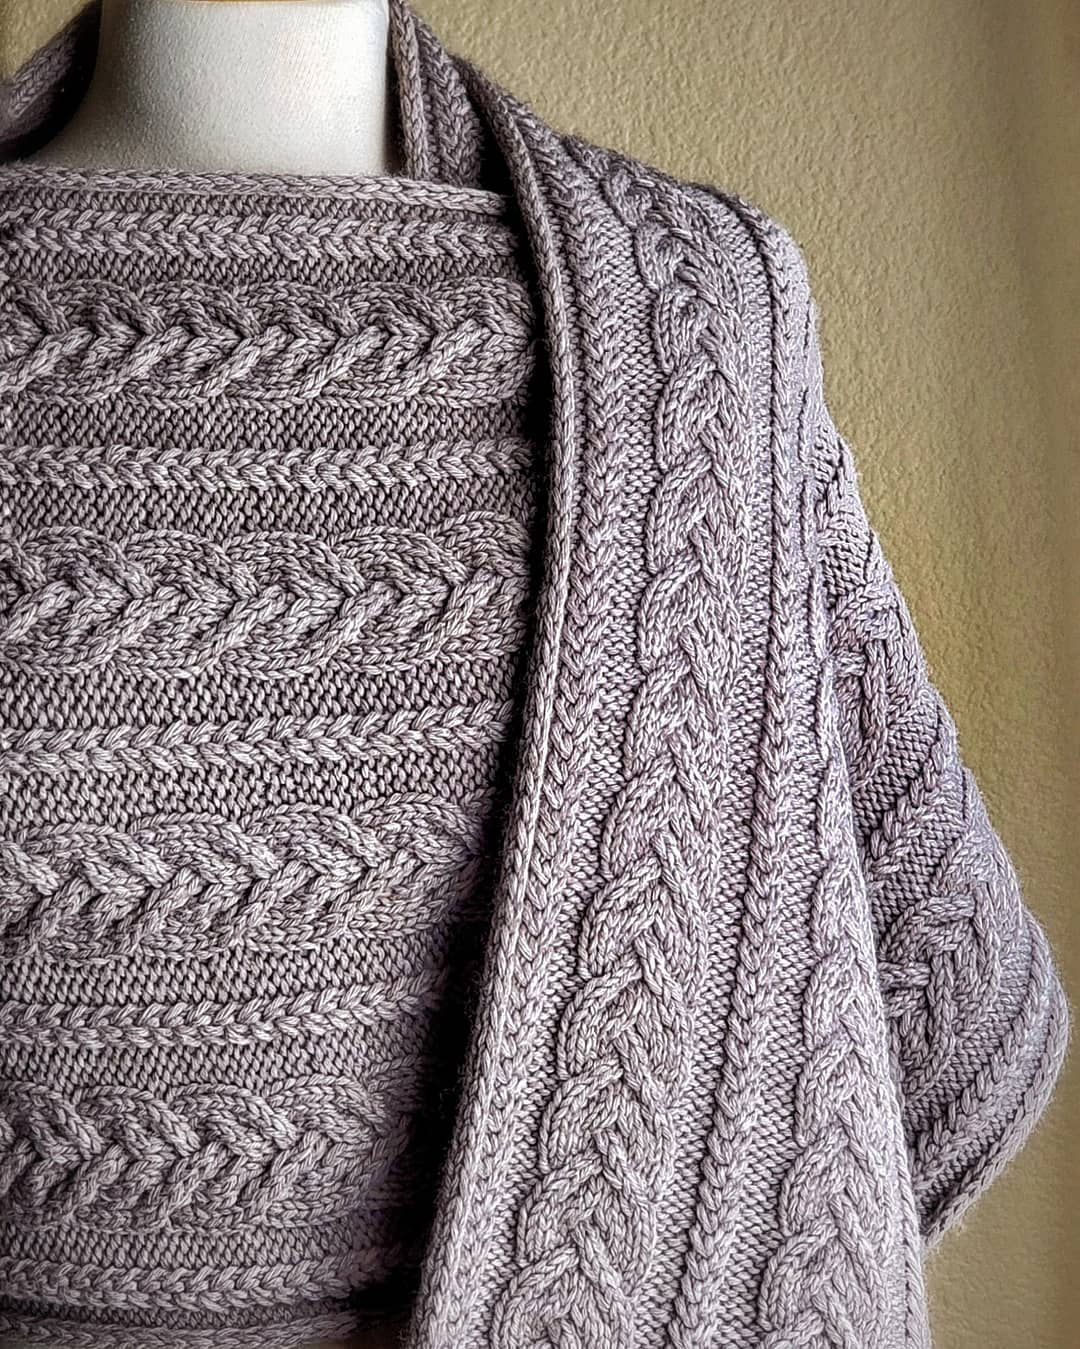 Happy Friday, Friends! 🍁 I Am Happy To Knitting - Knitting